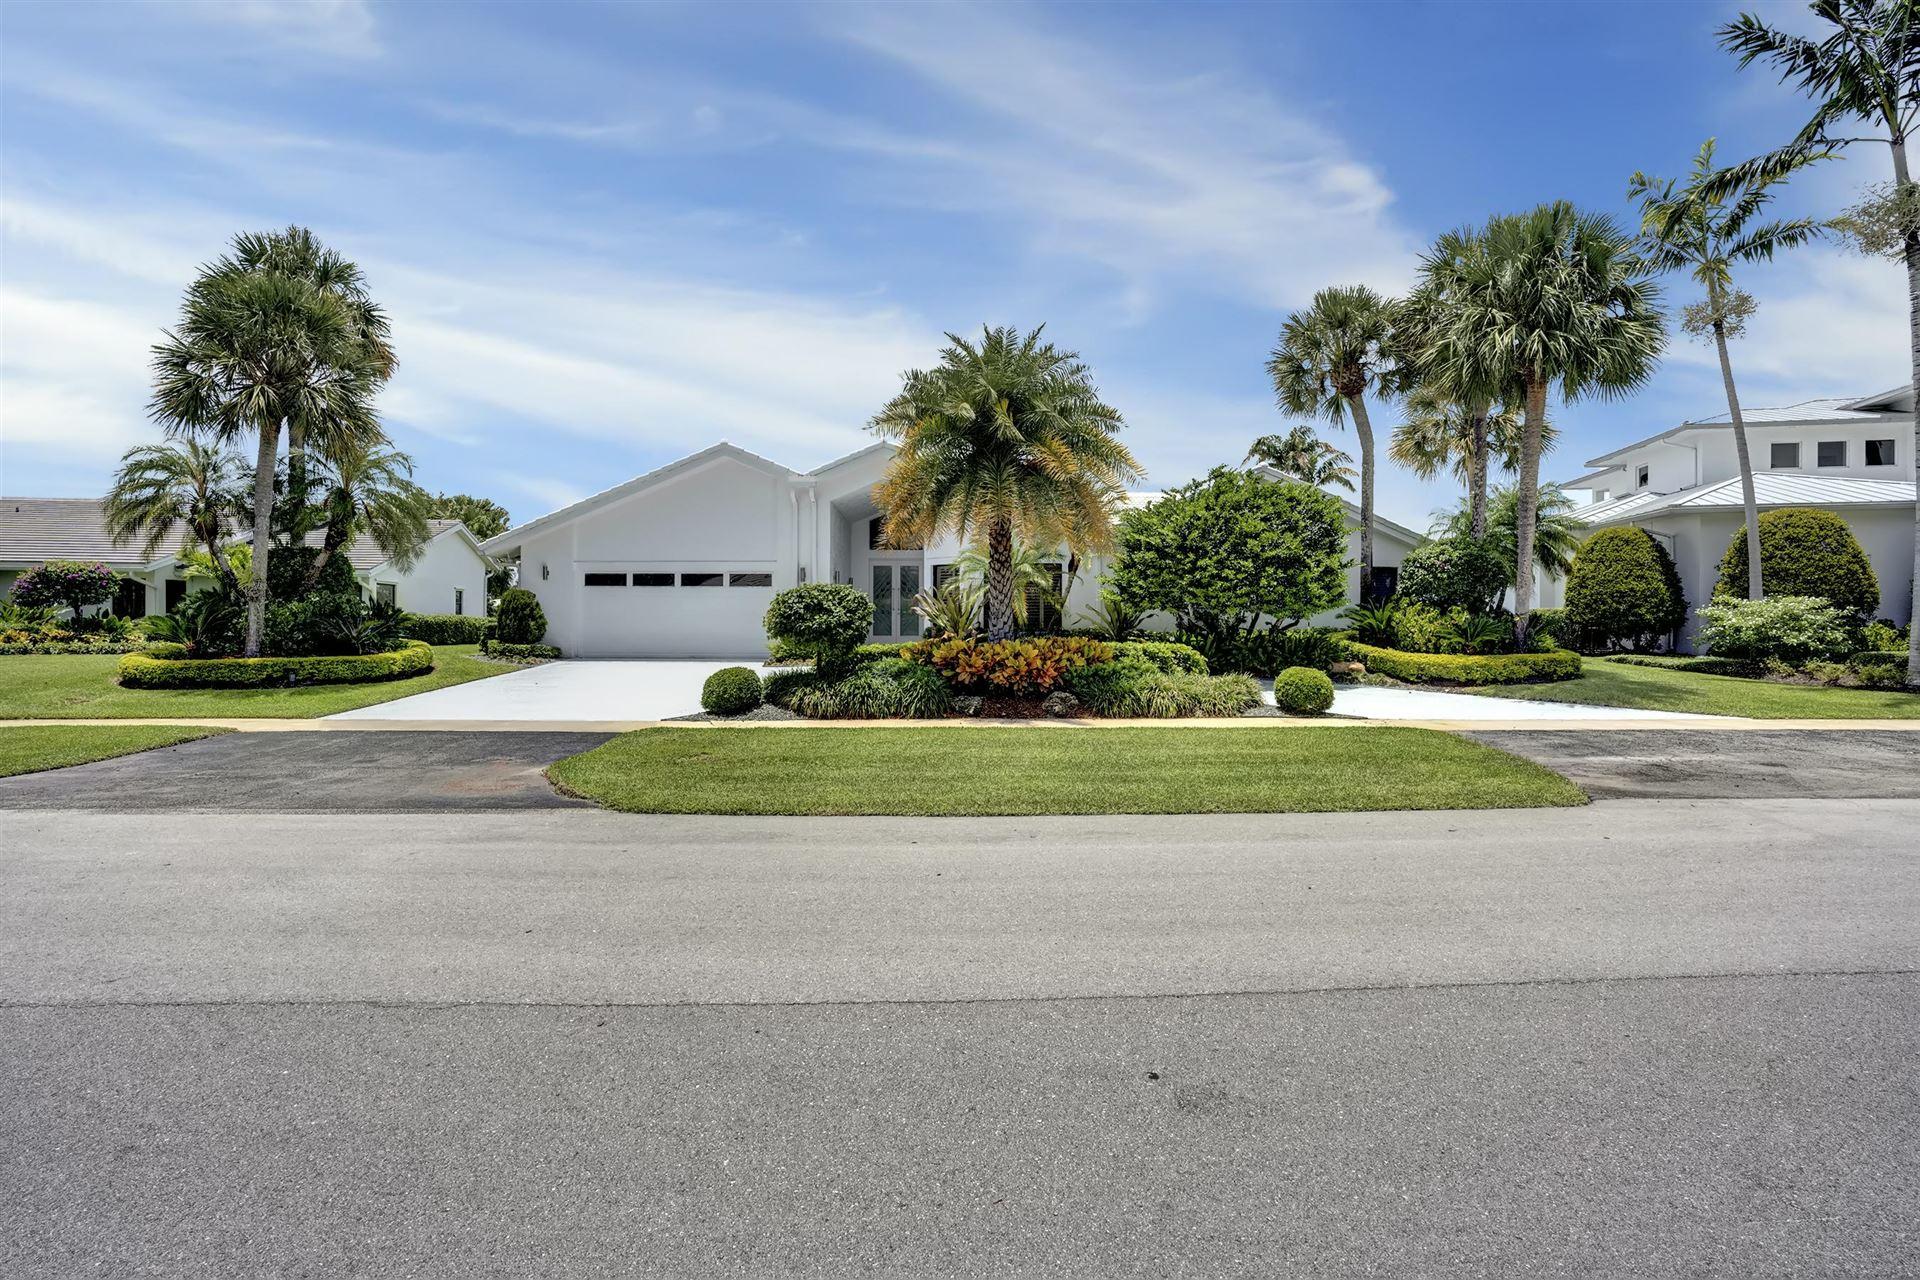 16870 River Birch Circle, Delray Beach, FL 33445 - #: RX-10635840